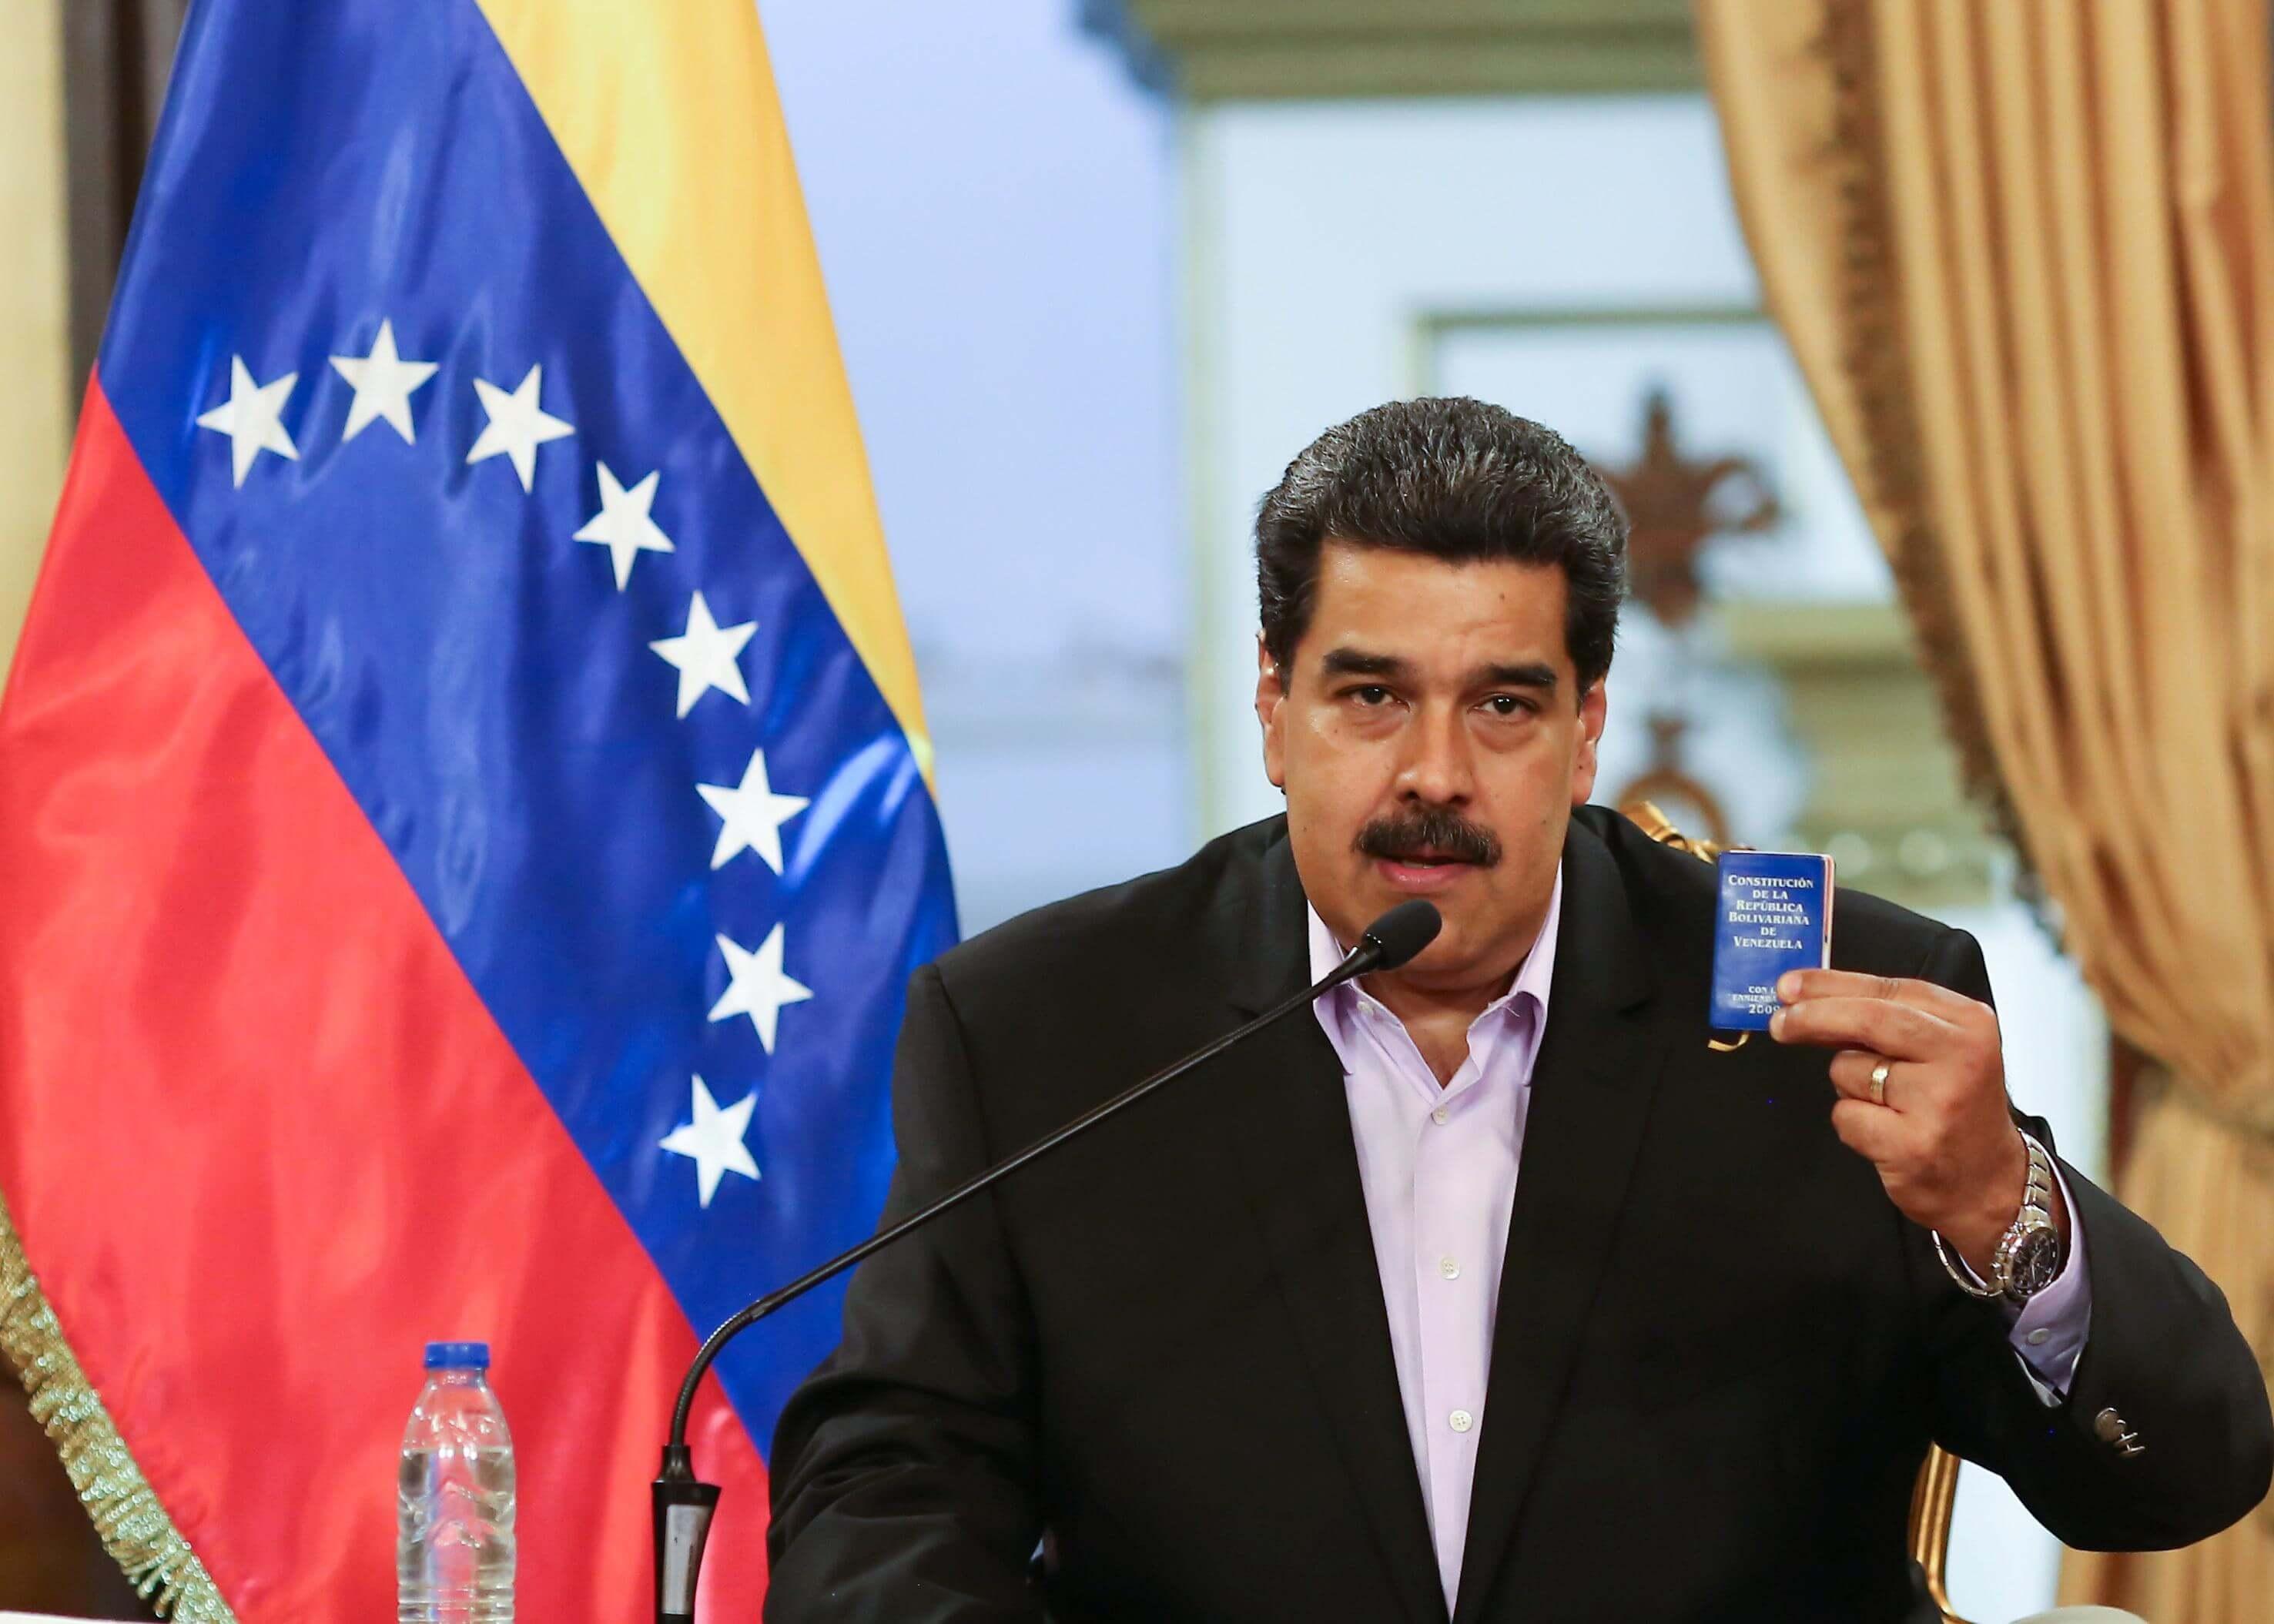 Venezuela shocked over US sanctions